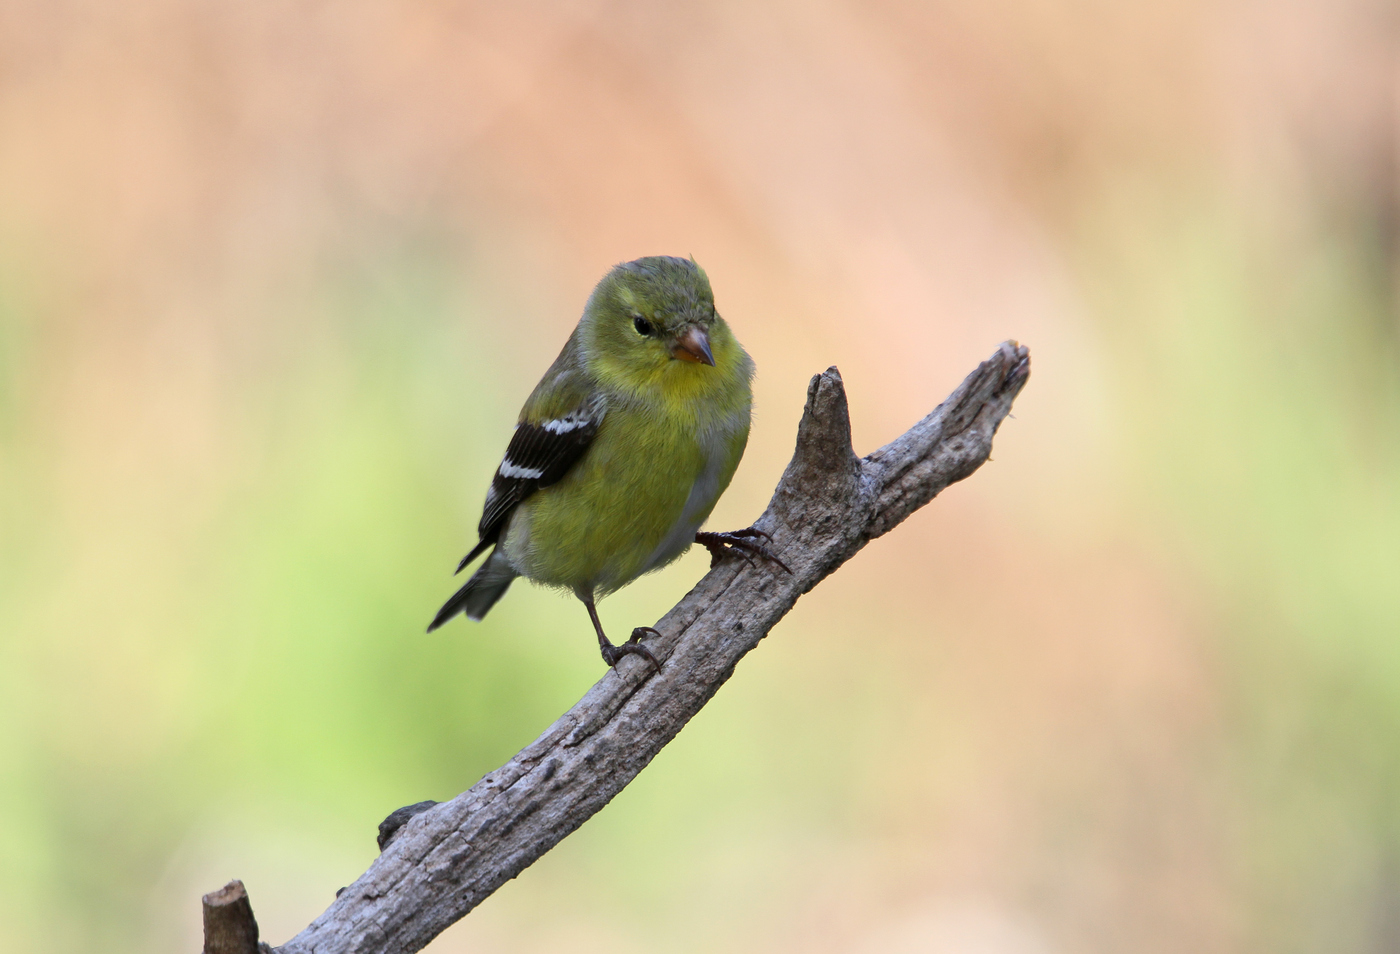 Female Goldfinch #4